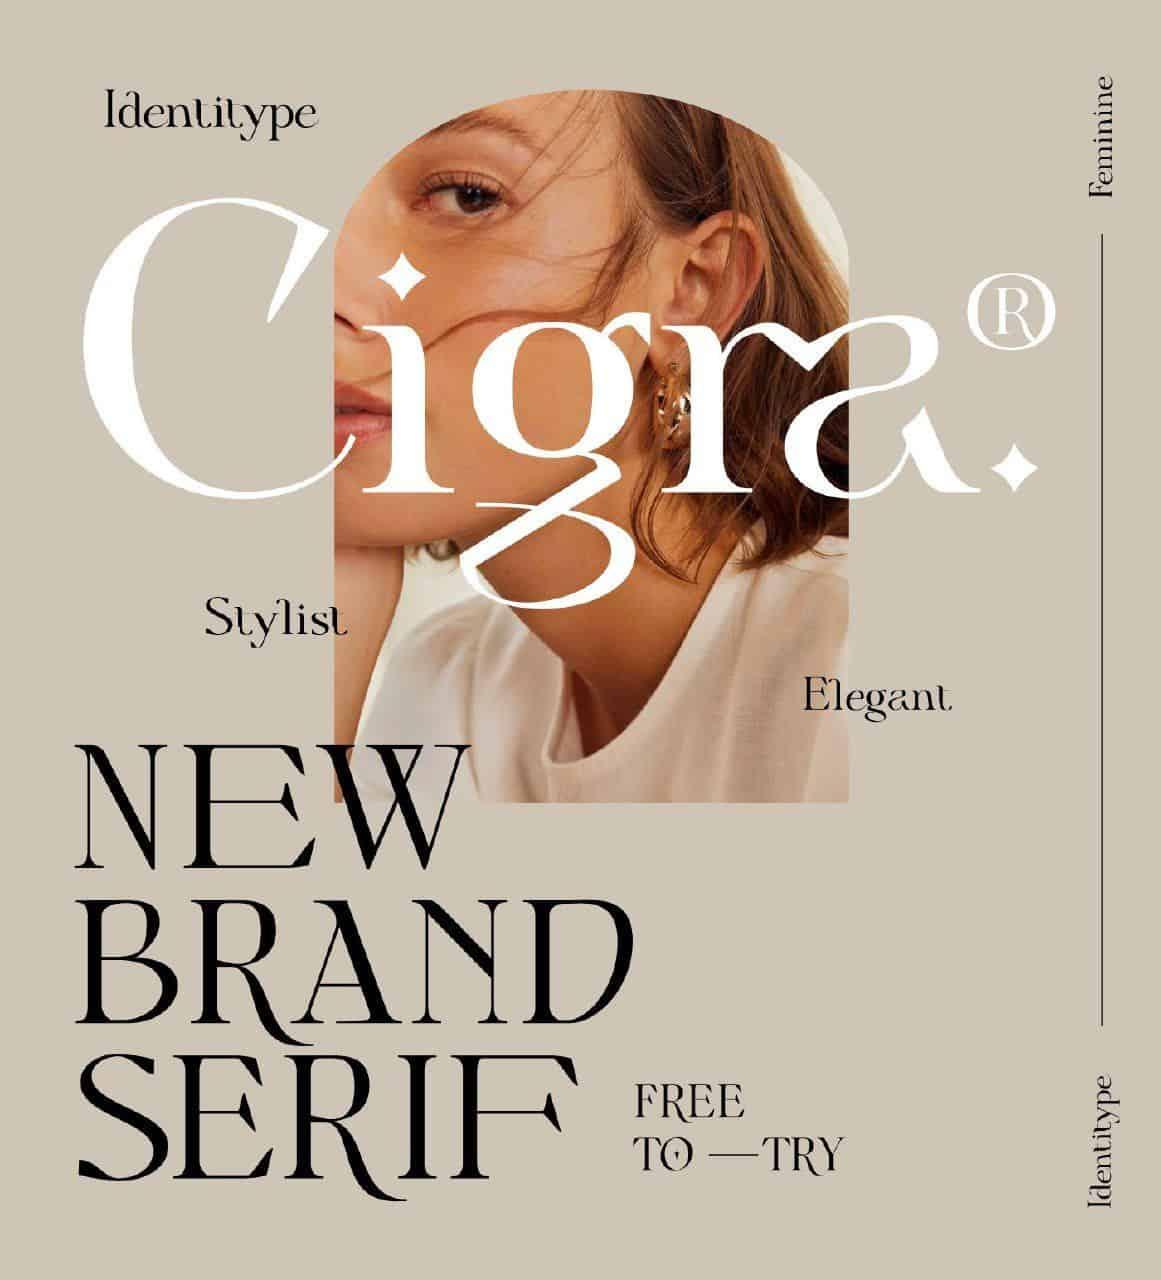 Download Cigra font (typeface)